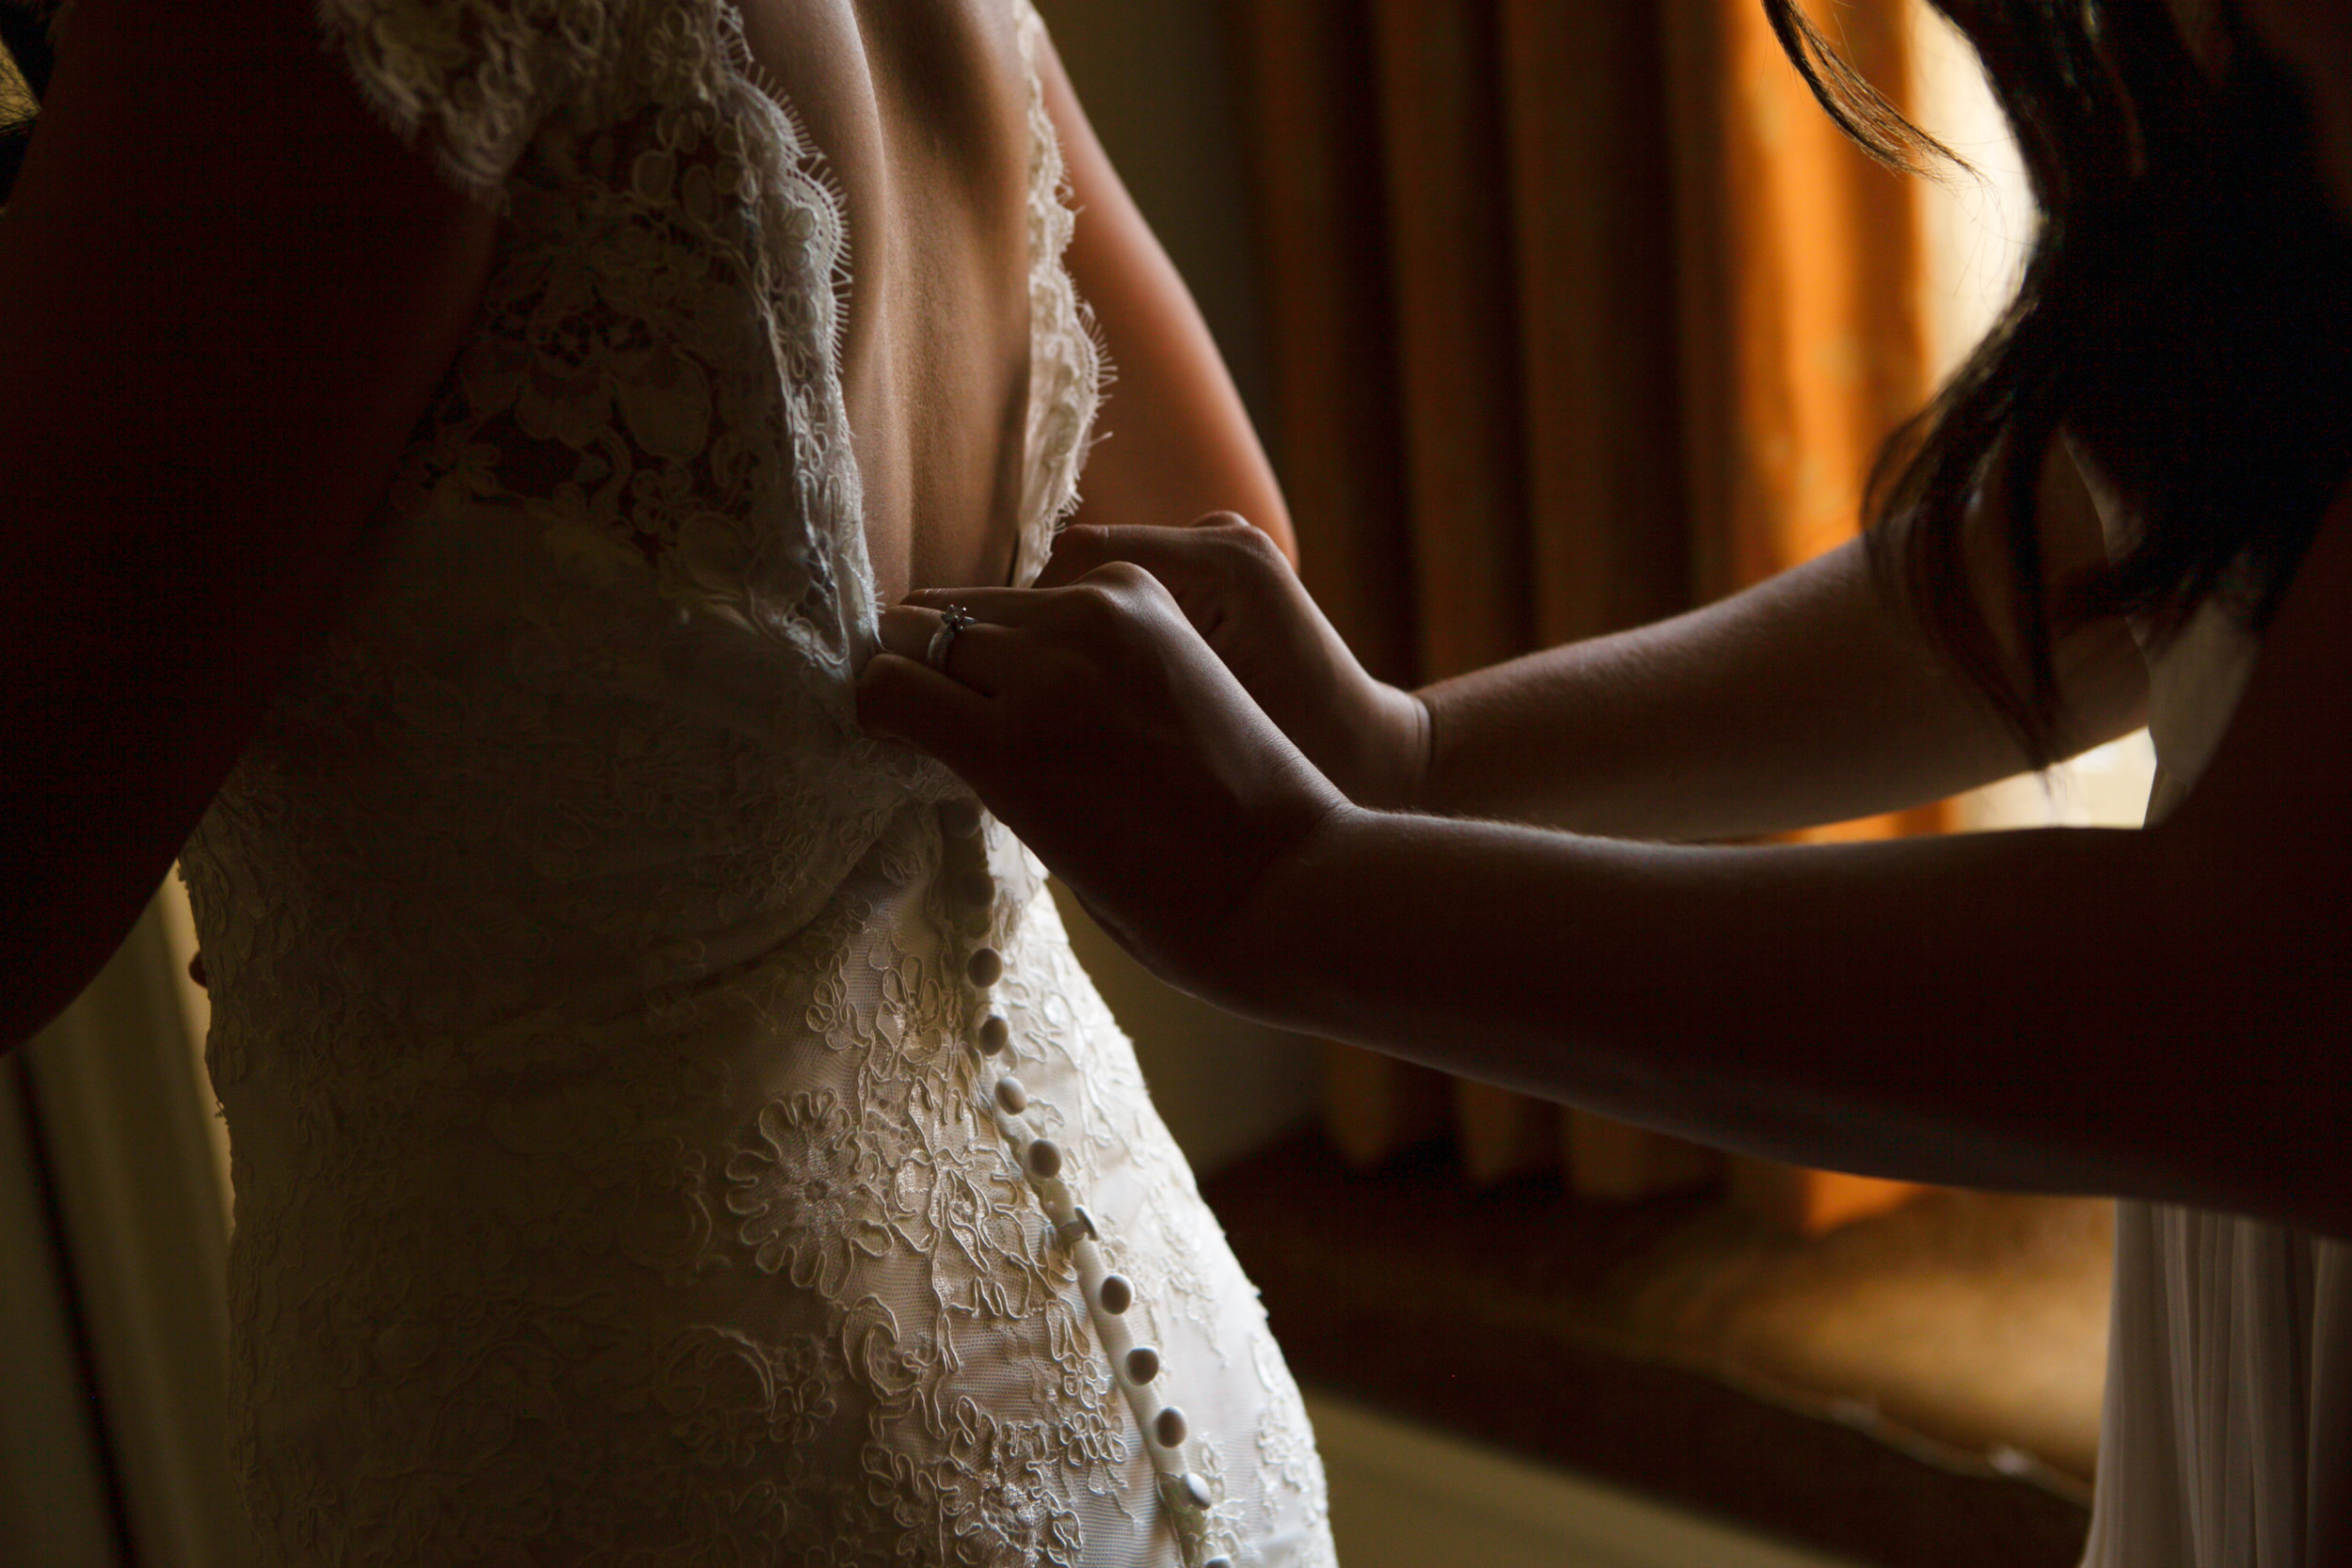 WEDDING AT MISSION INN IN RIVERSIDE, CALIFORNIA